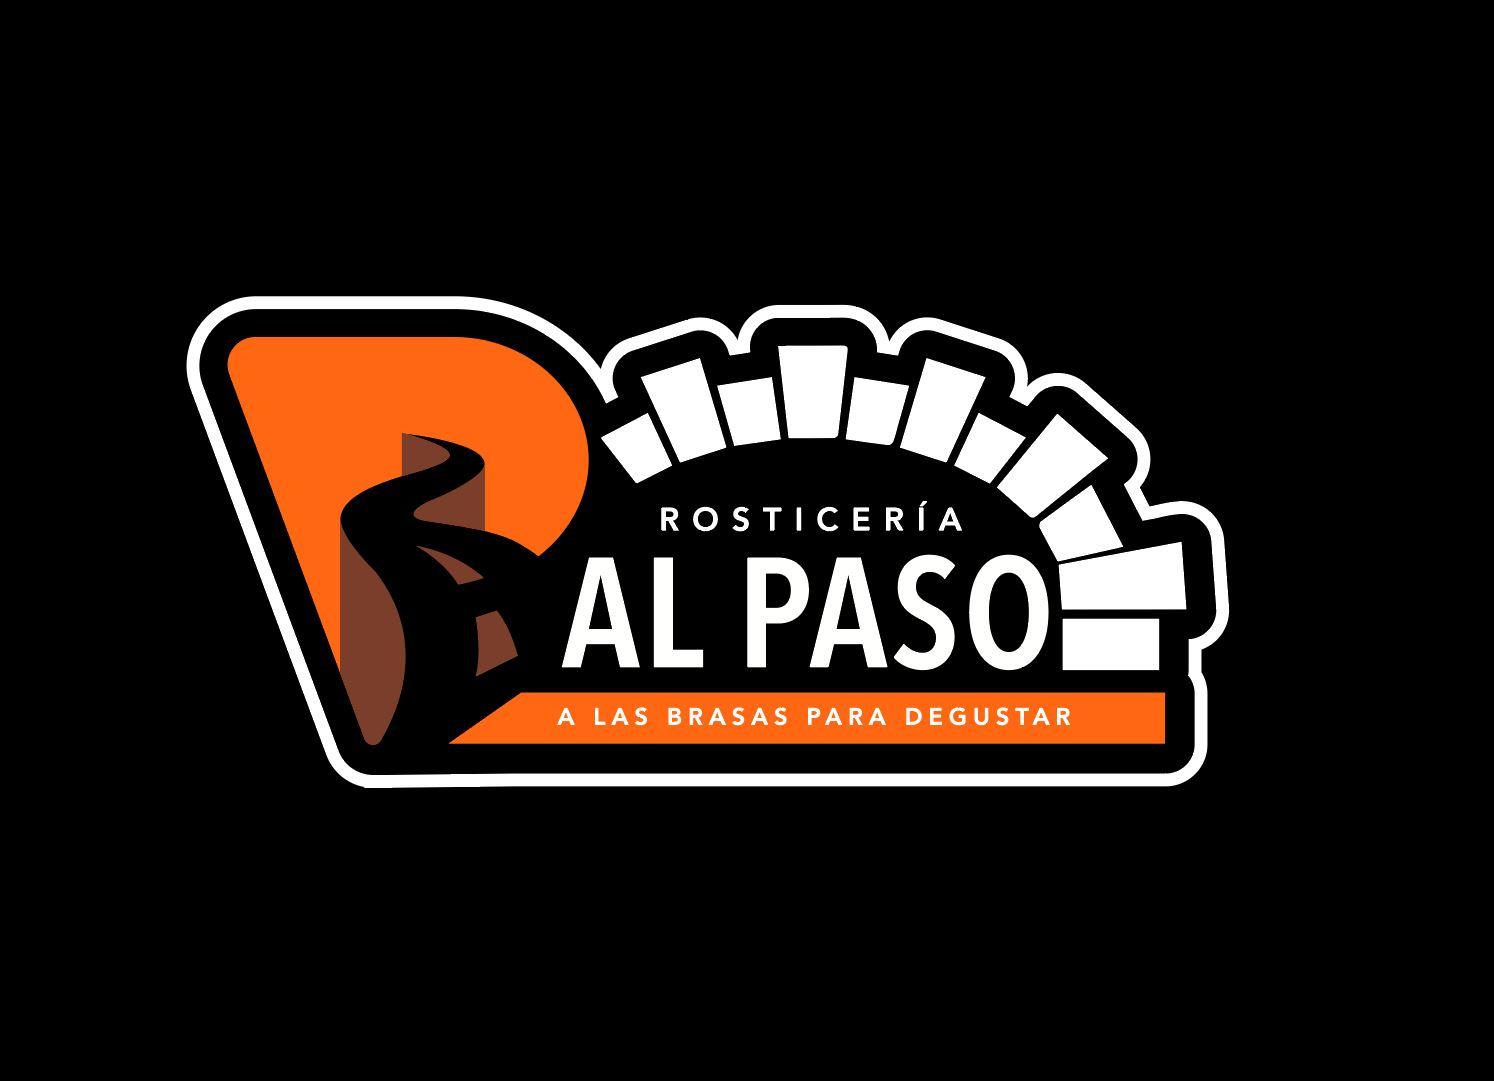 logo_alpaso